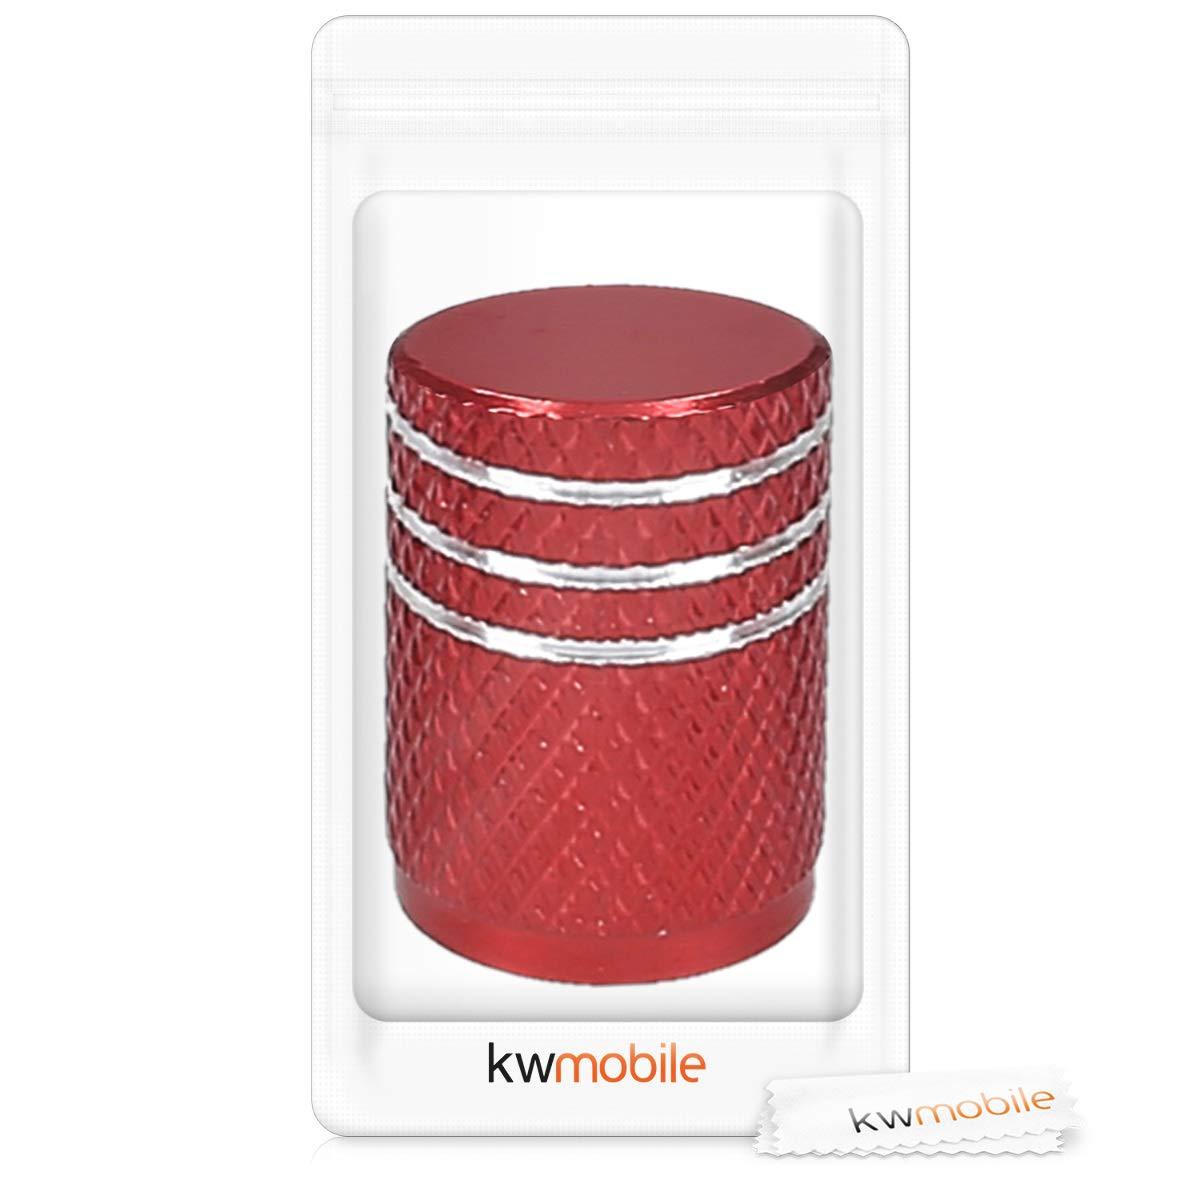 kwmobile 5en1 Tapas de Metal para v/álvula de neum/áticos de Coche Moto Bicicleta Juego de Tapas de v/álvula en Naranja